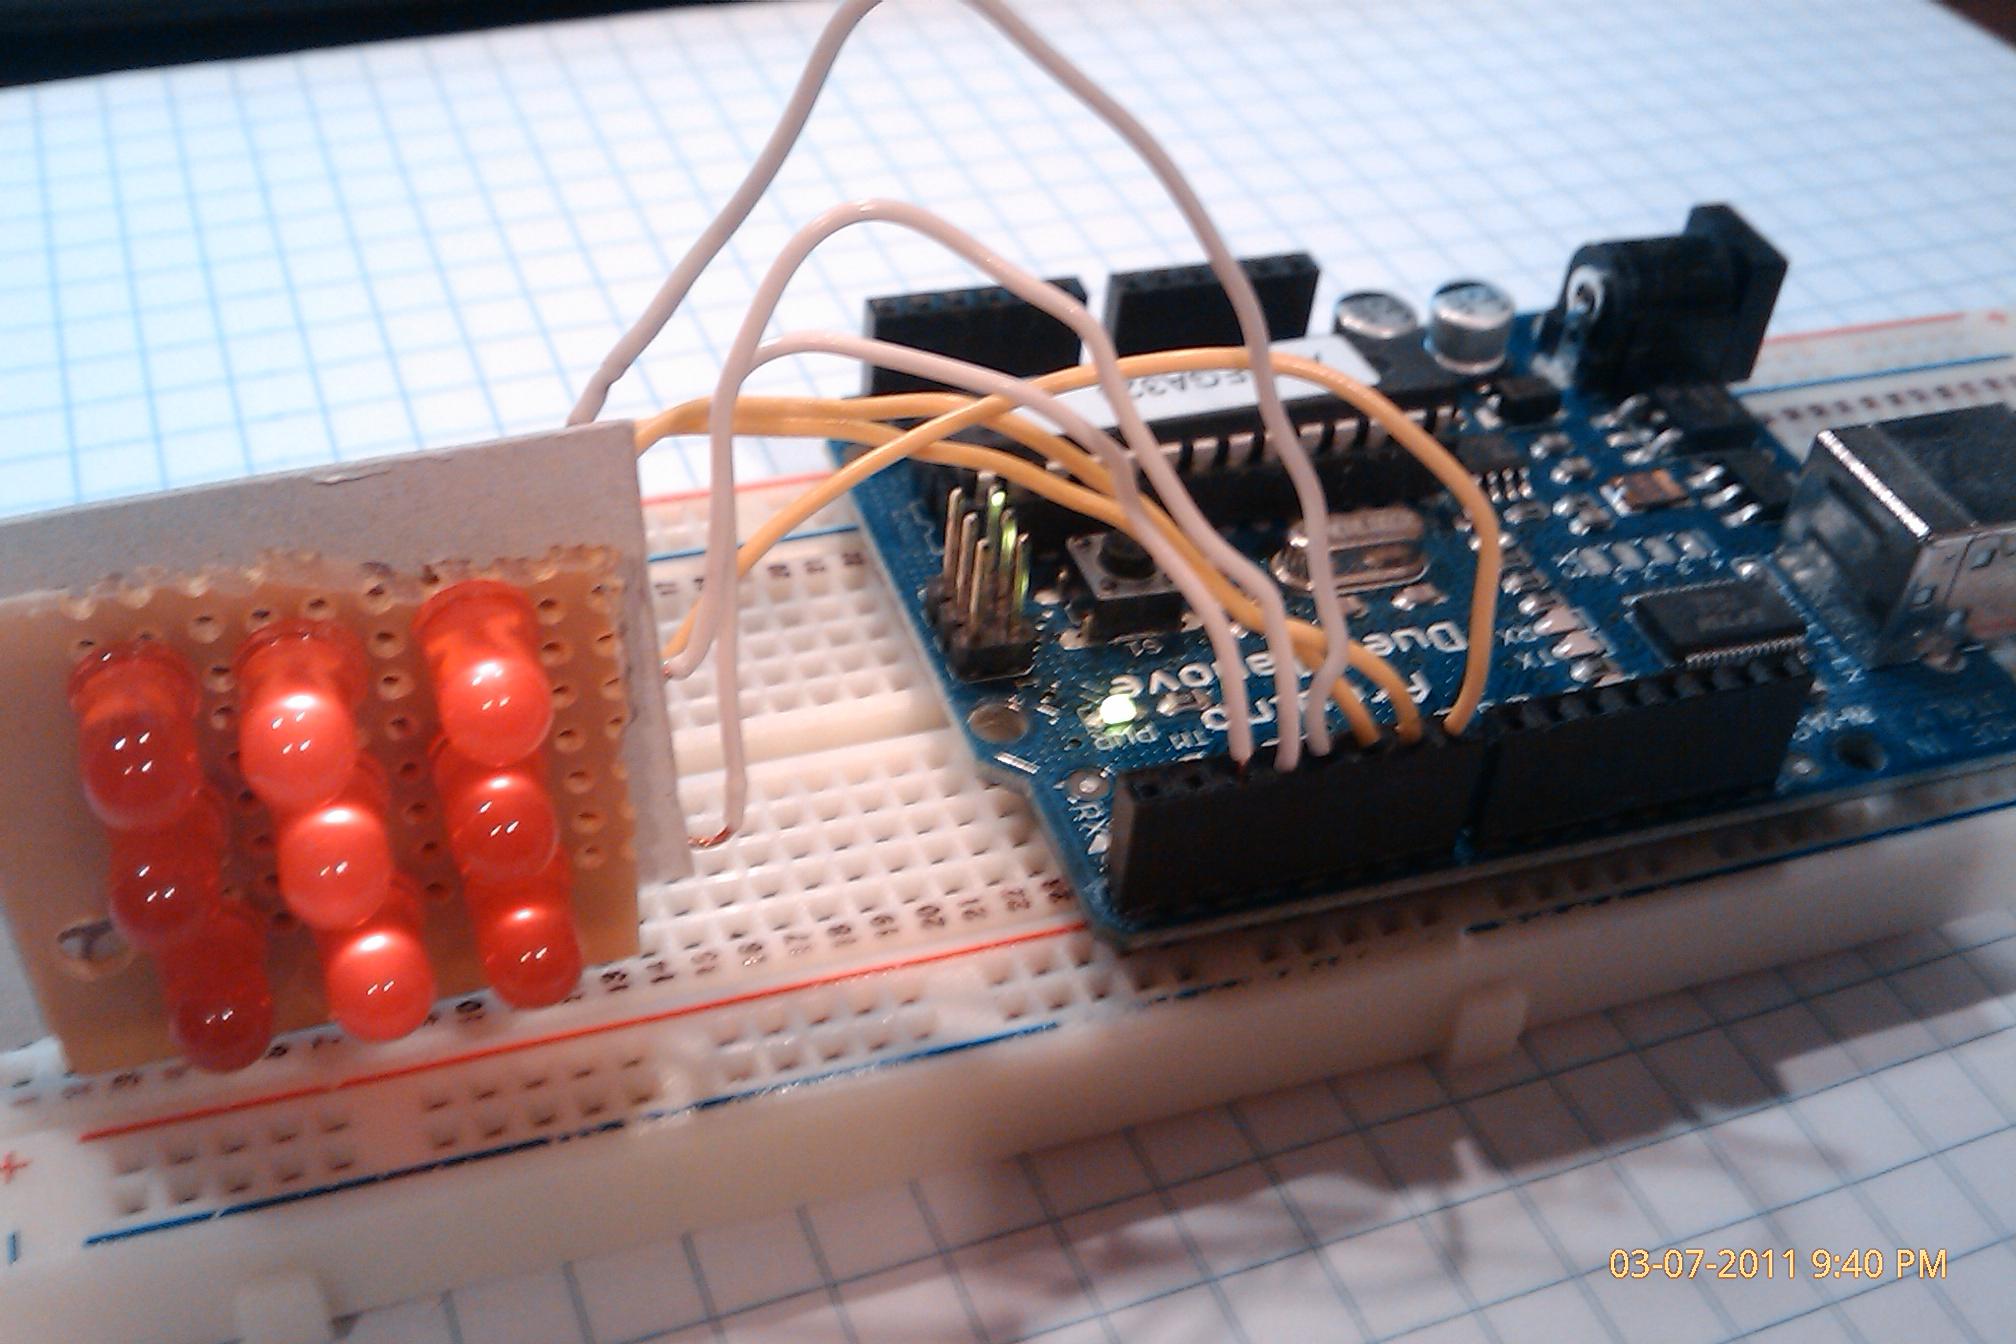 LED Matrix Driven by an Arduino